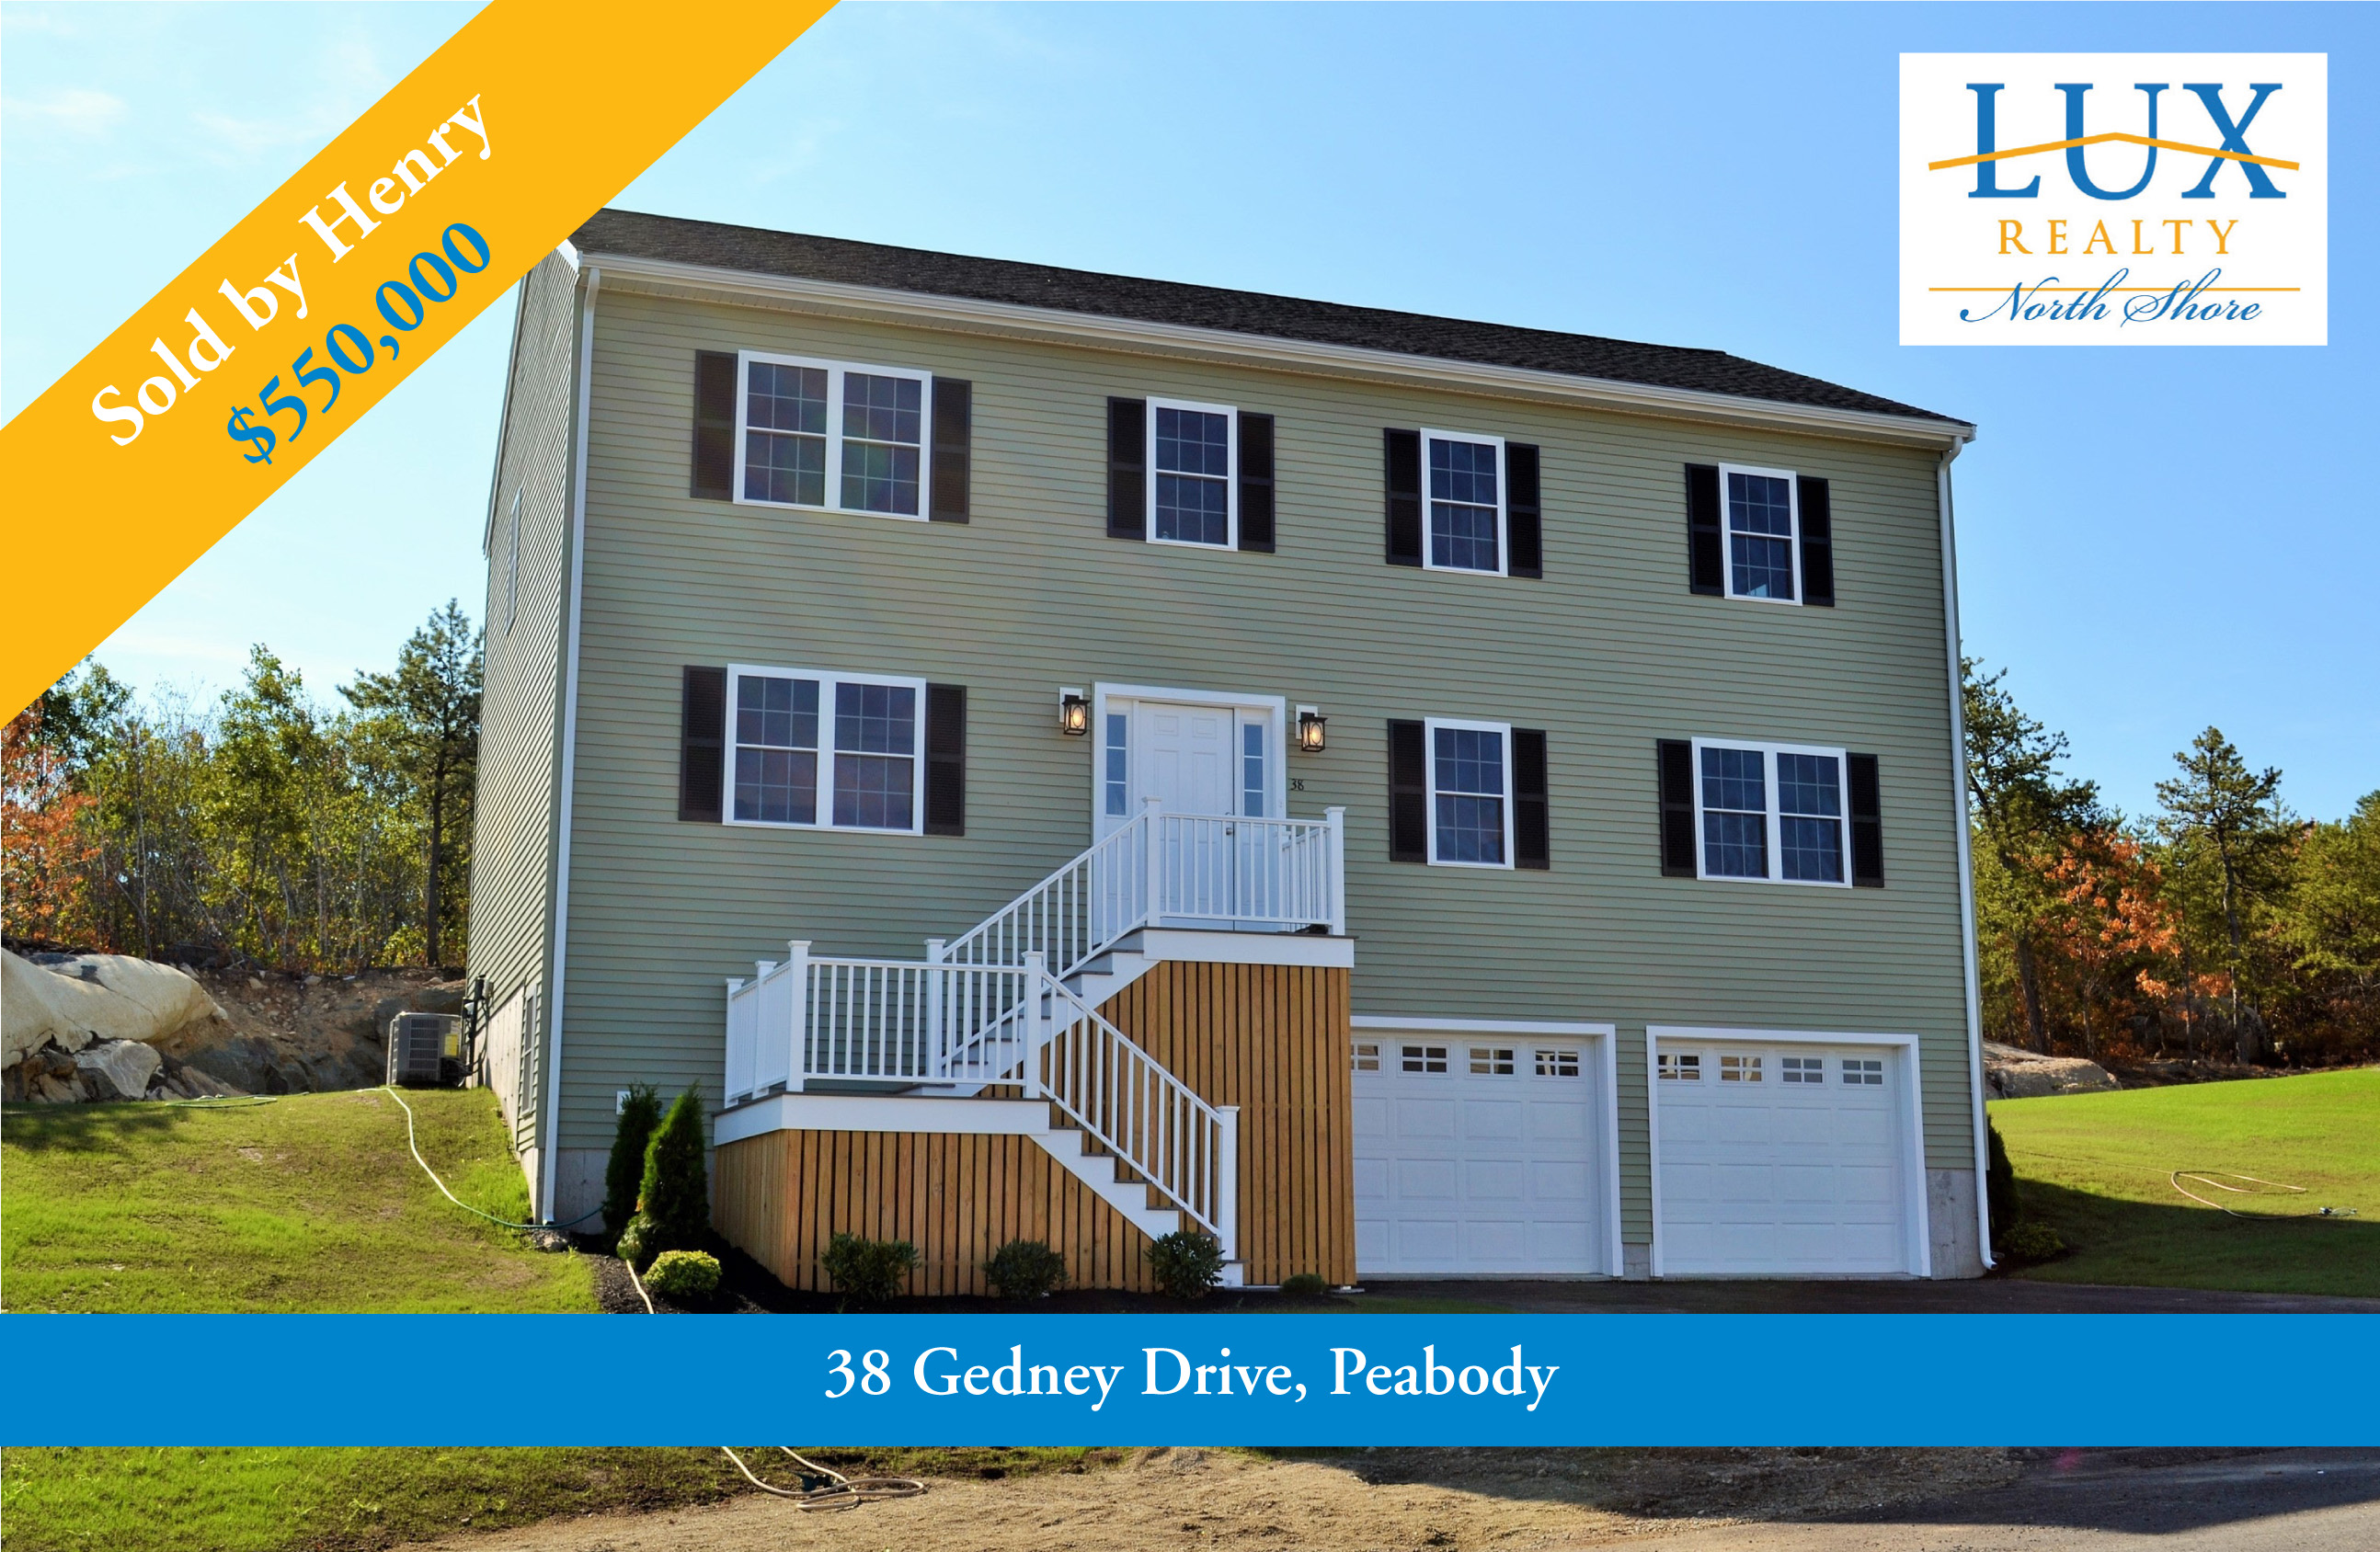 Gedney Drive, Peabody, MA